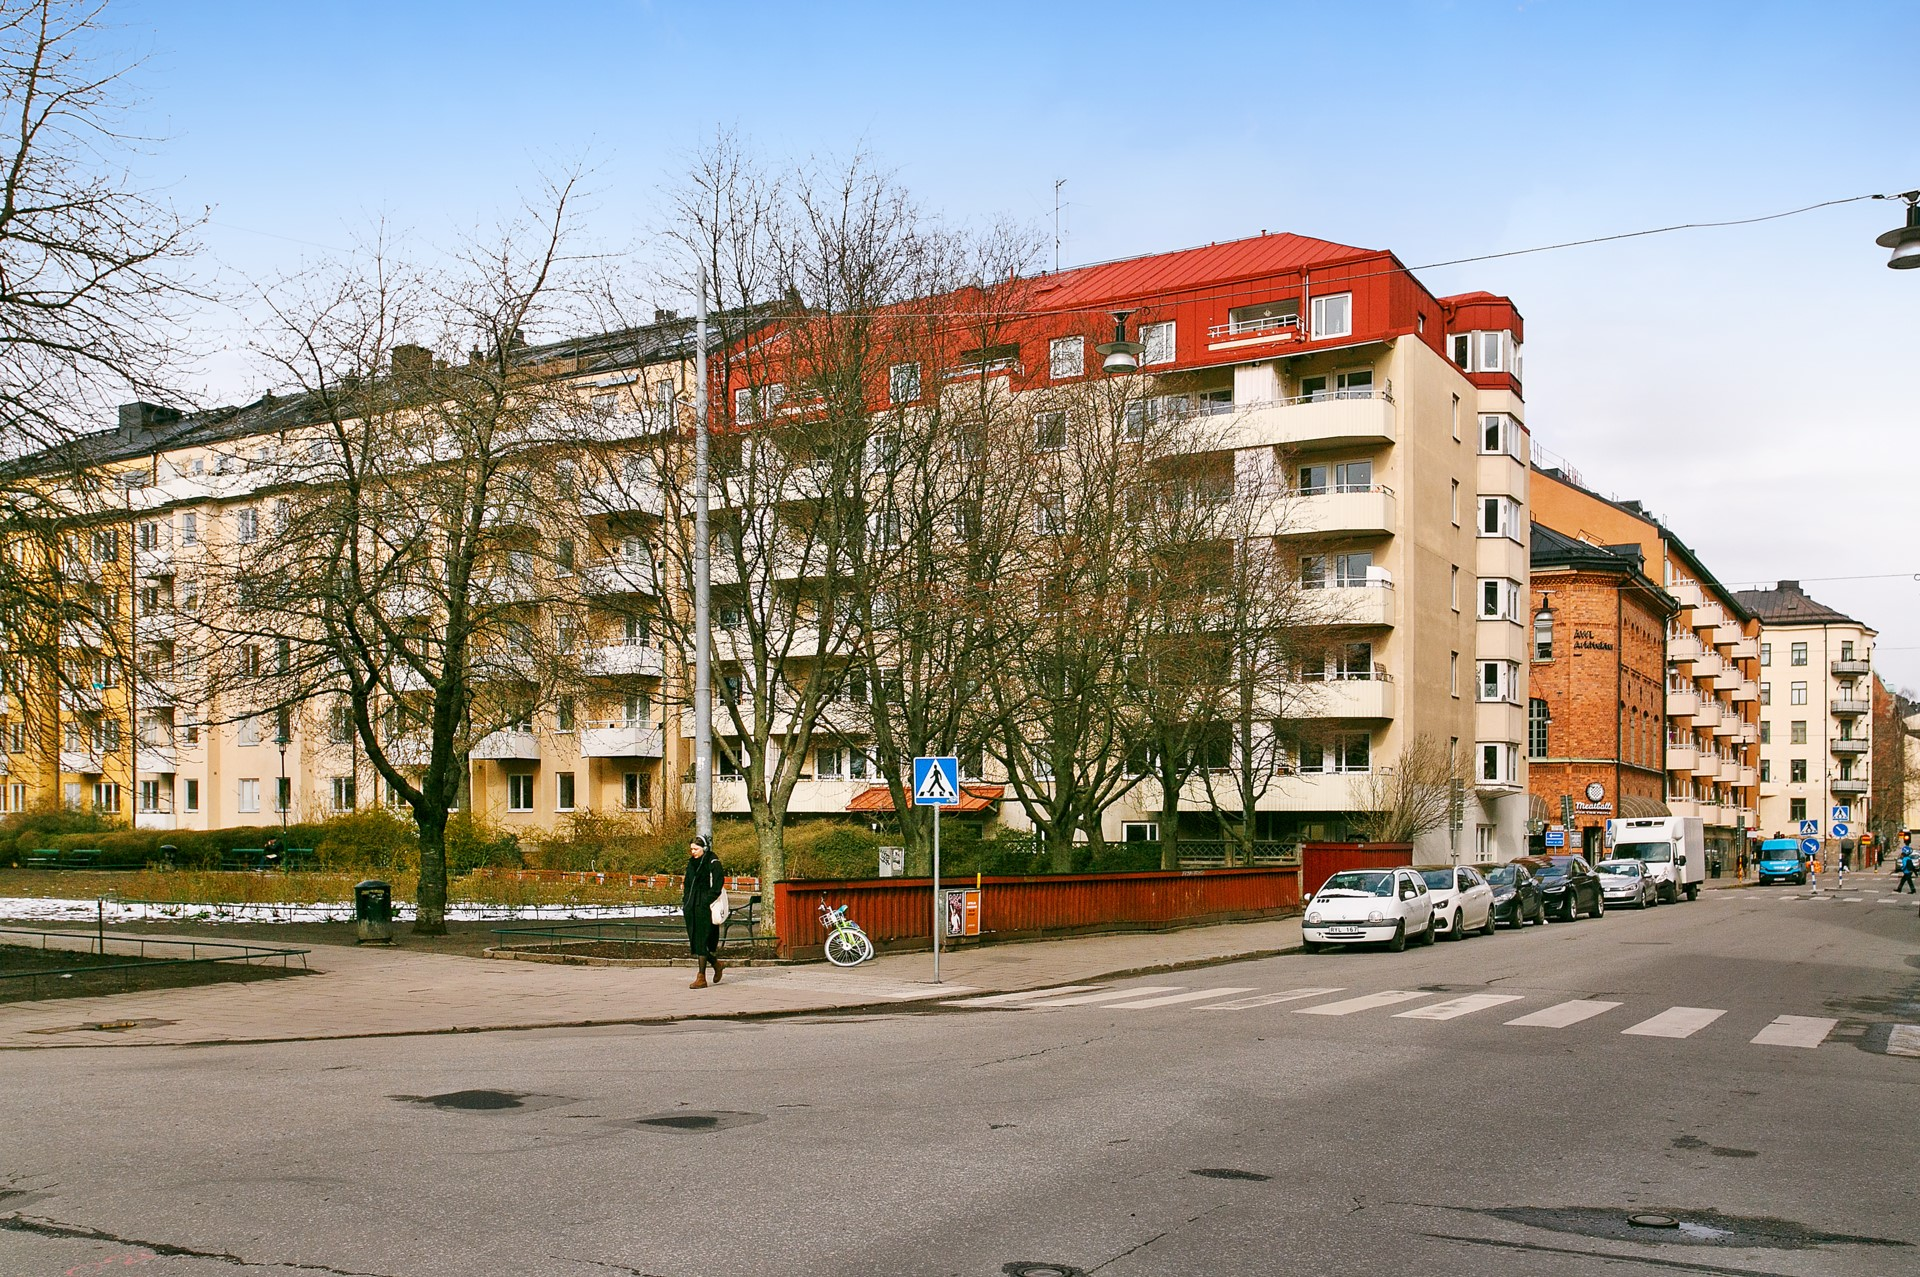 Kocksgatan 42 - Fasadbild